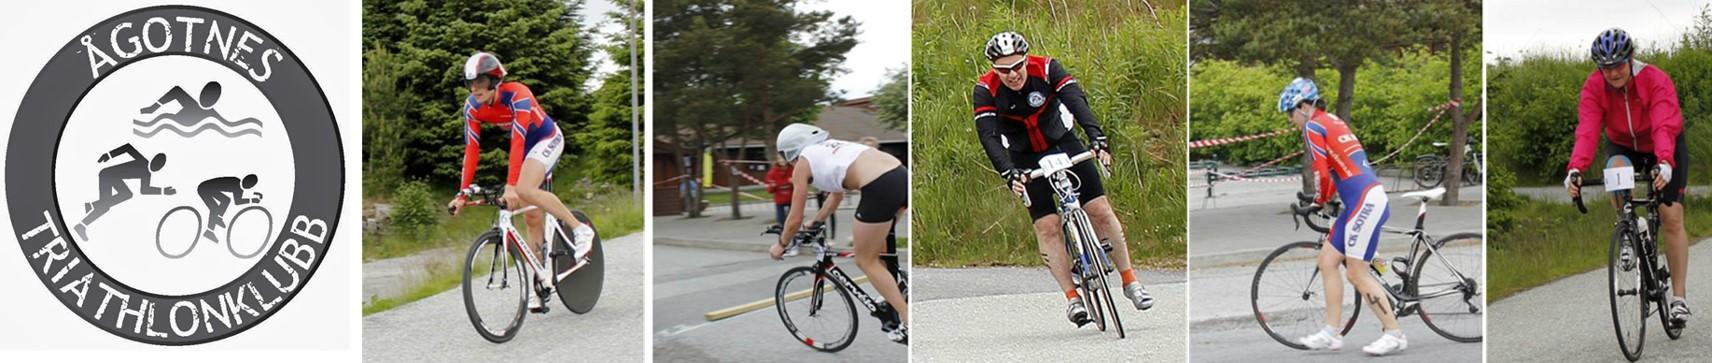 Ågotnes Triathlonklubb